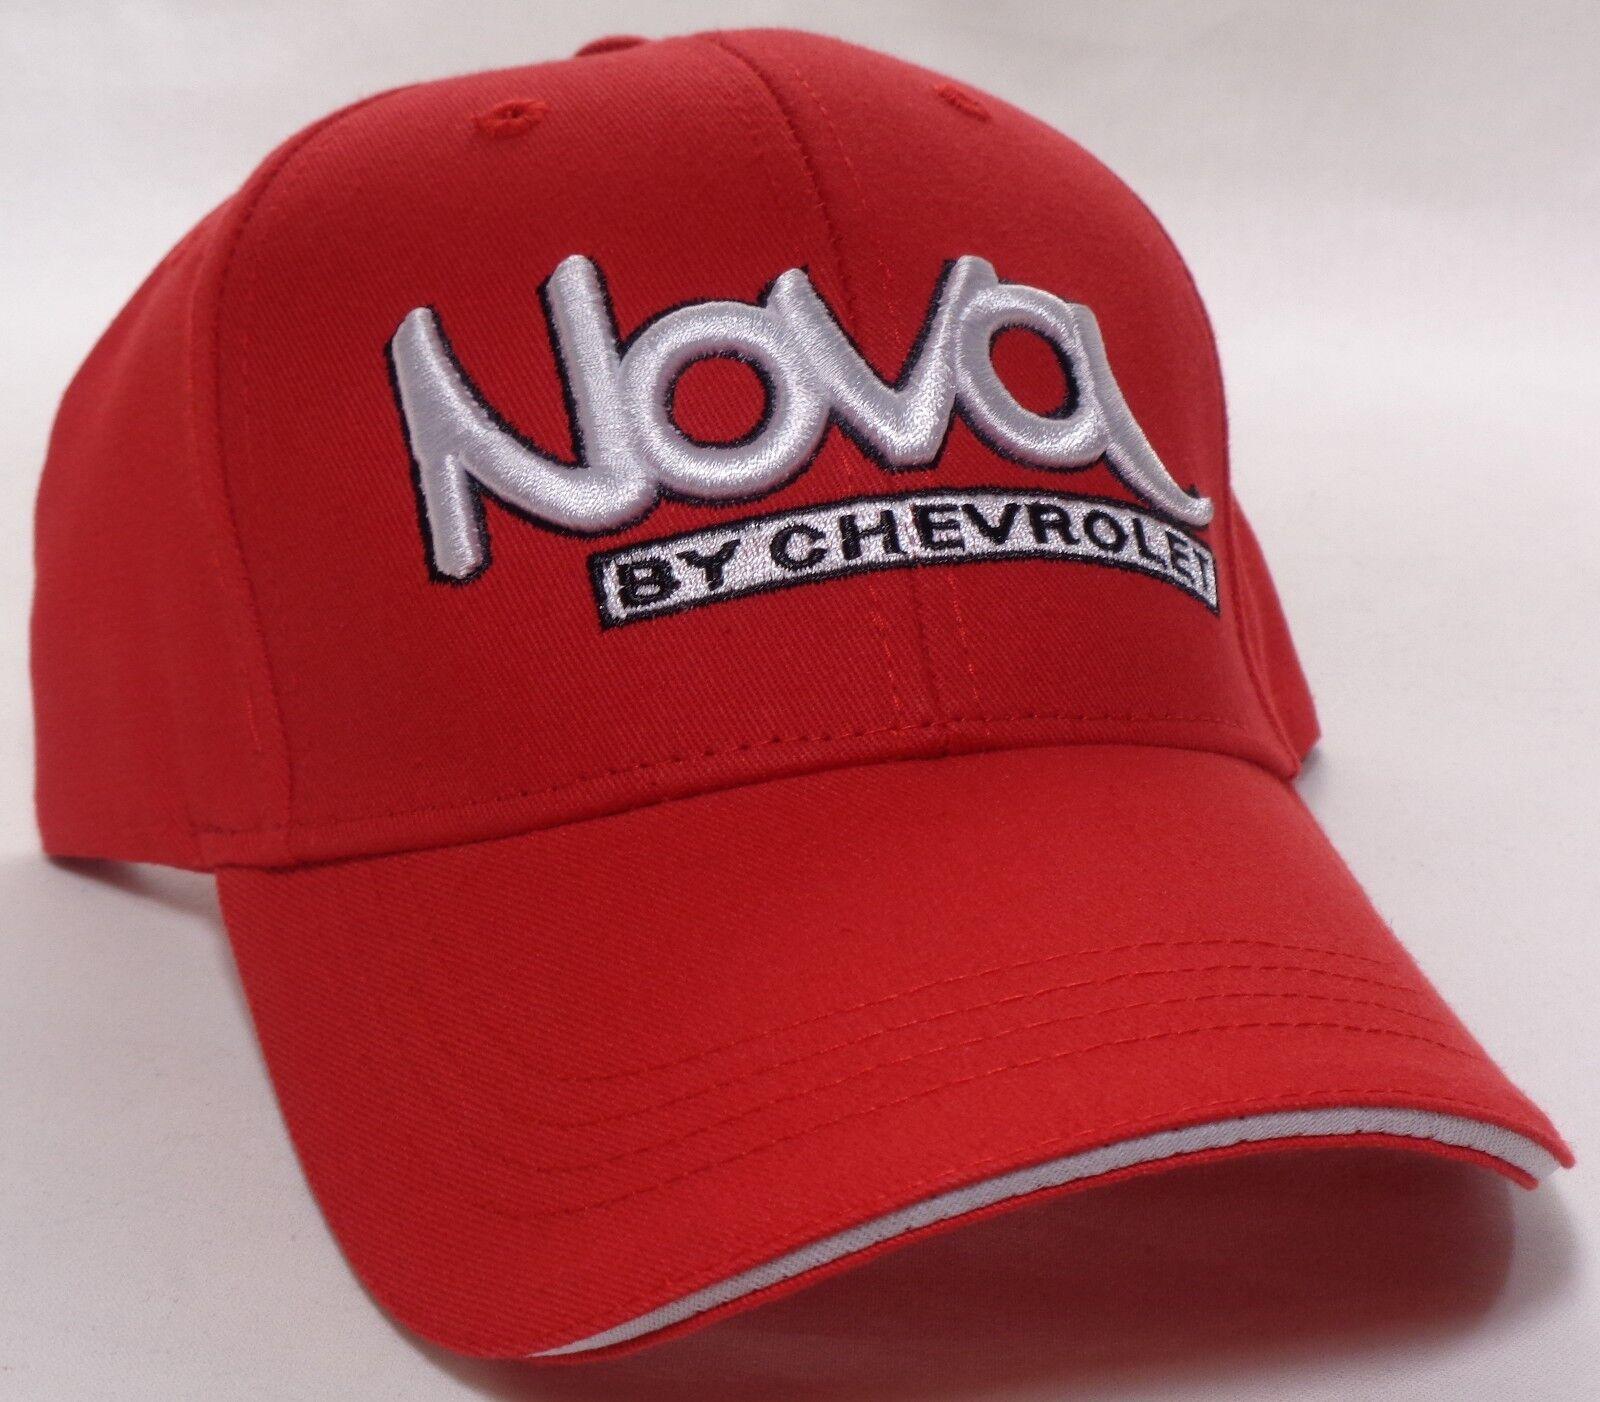 Hat H240 Cap Chevrolet Chevy Nova By Red H240 Hat fe953c